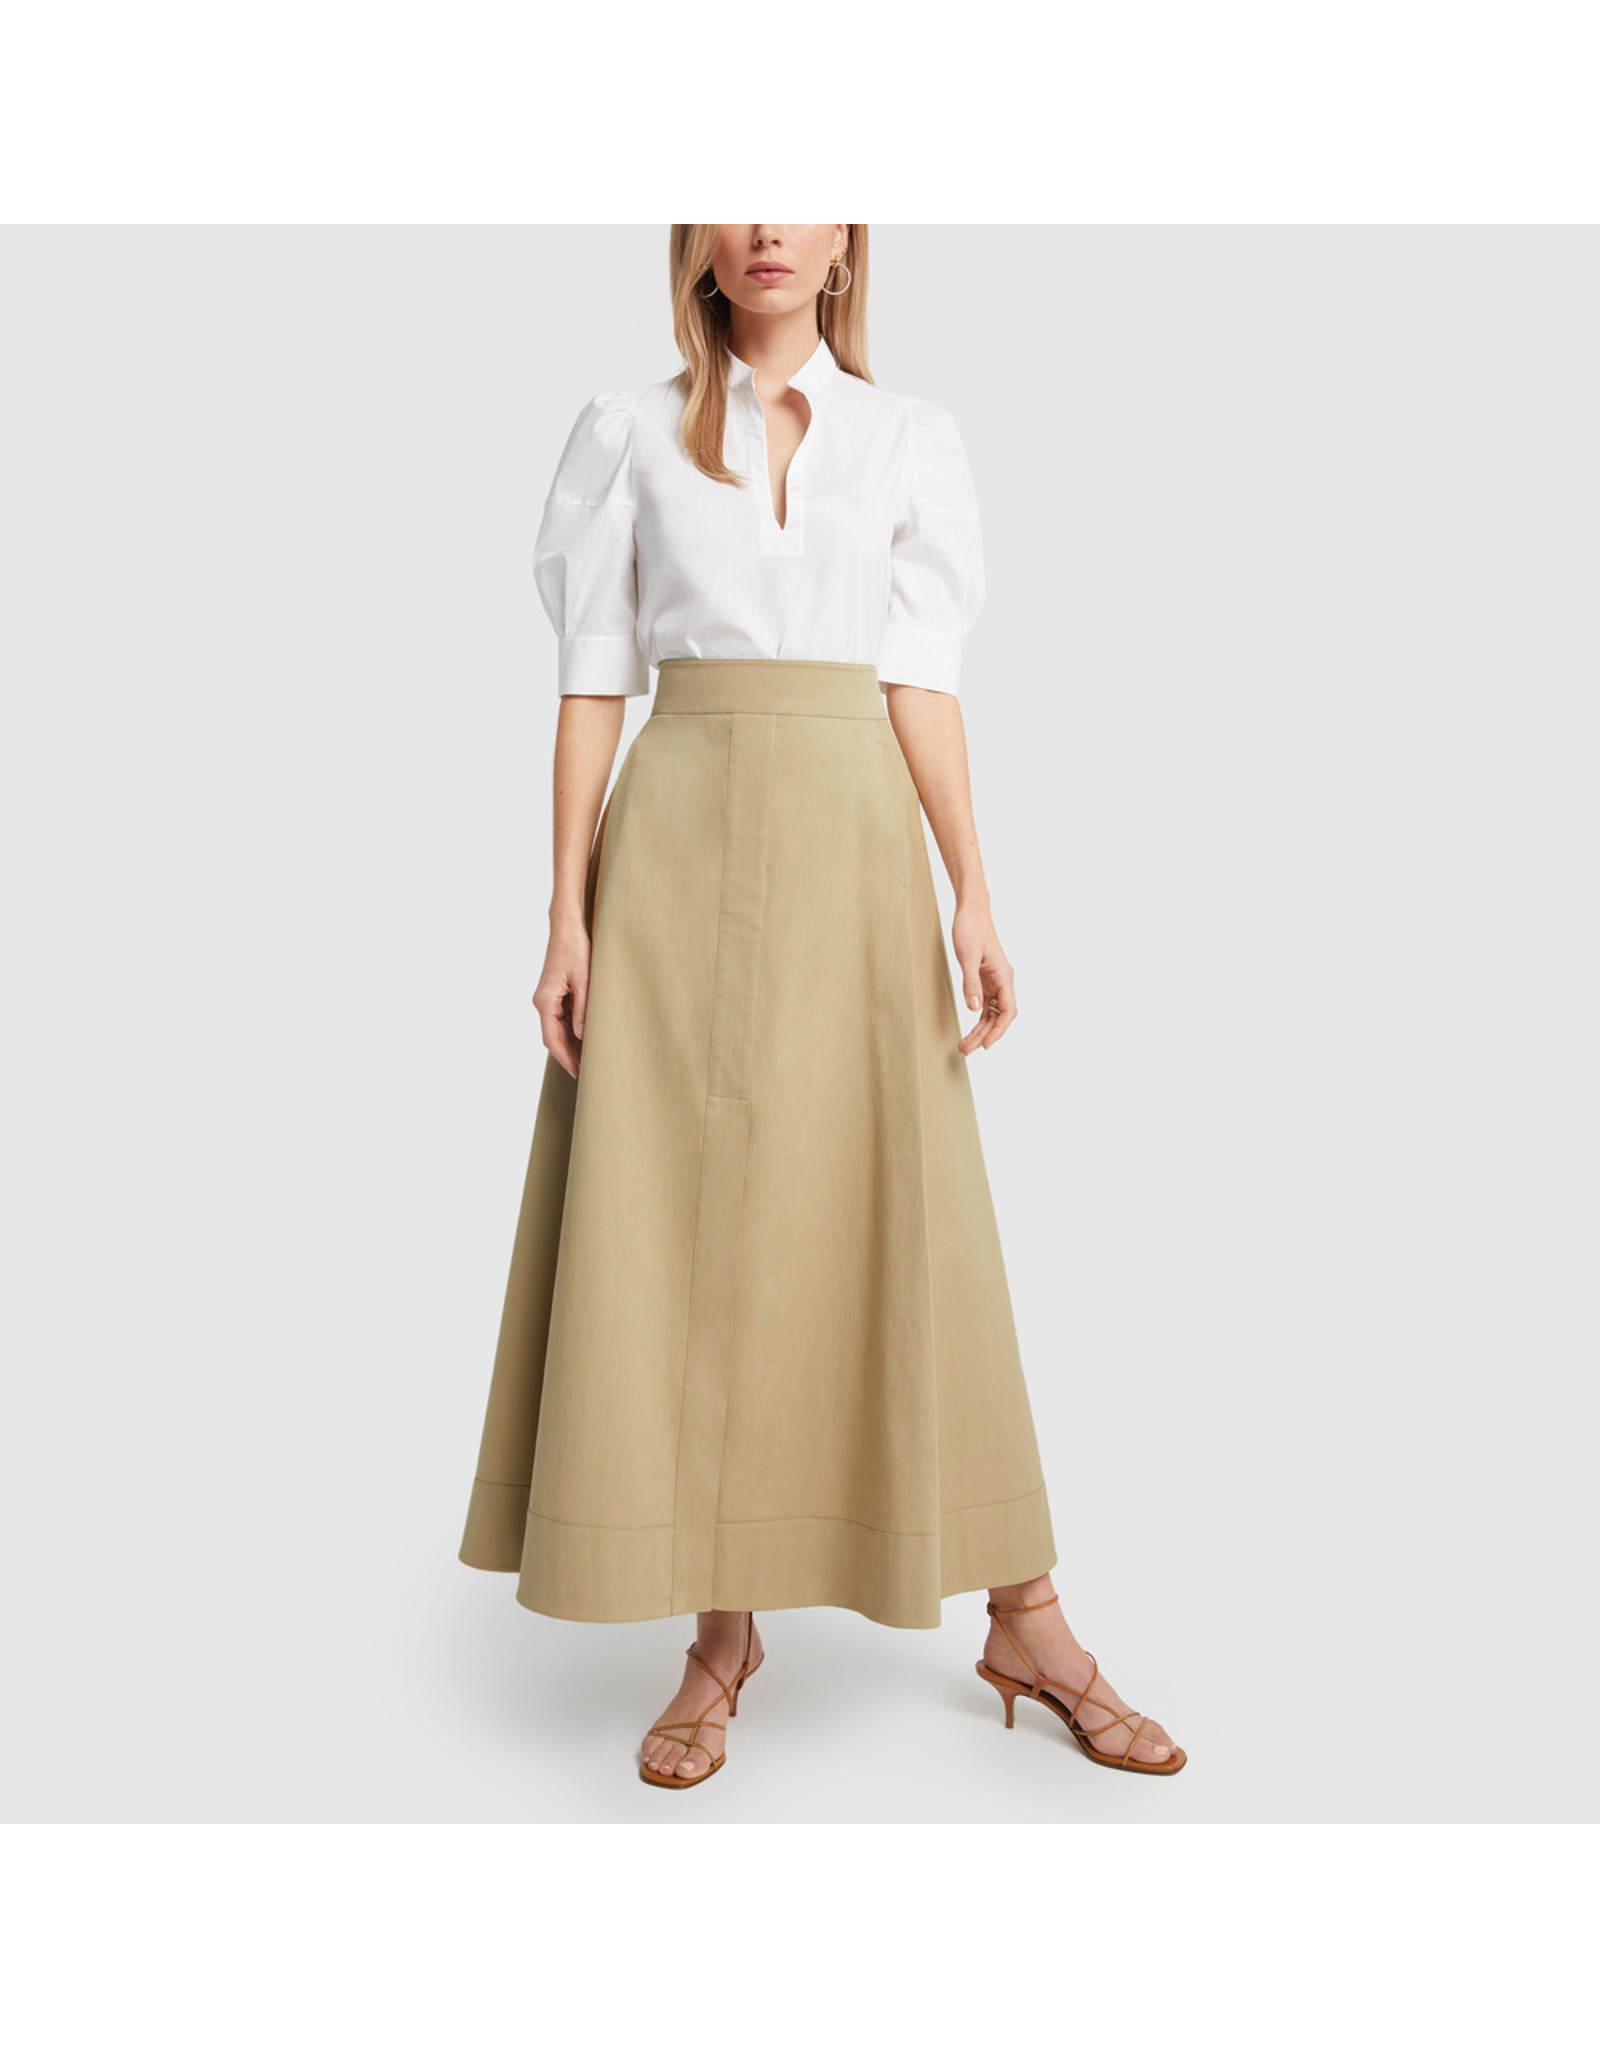 G. Label G. Label Diandra Maxi Skirt (Size: 0, Color: Khaki)